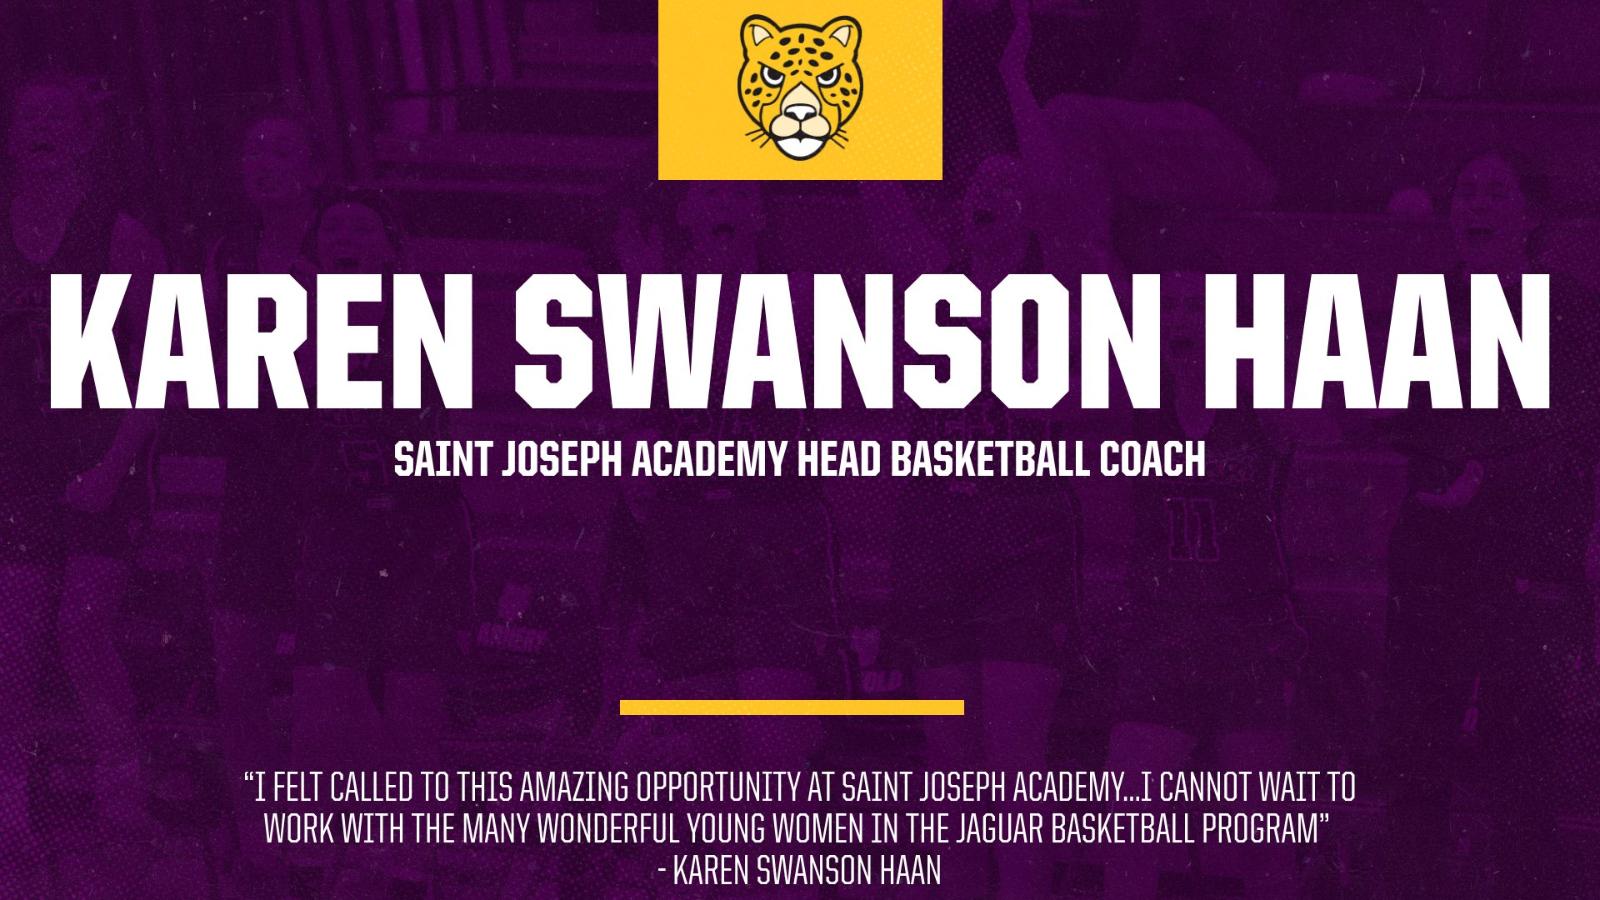 Karen Swanson Haan Named Head Basketball Coach